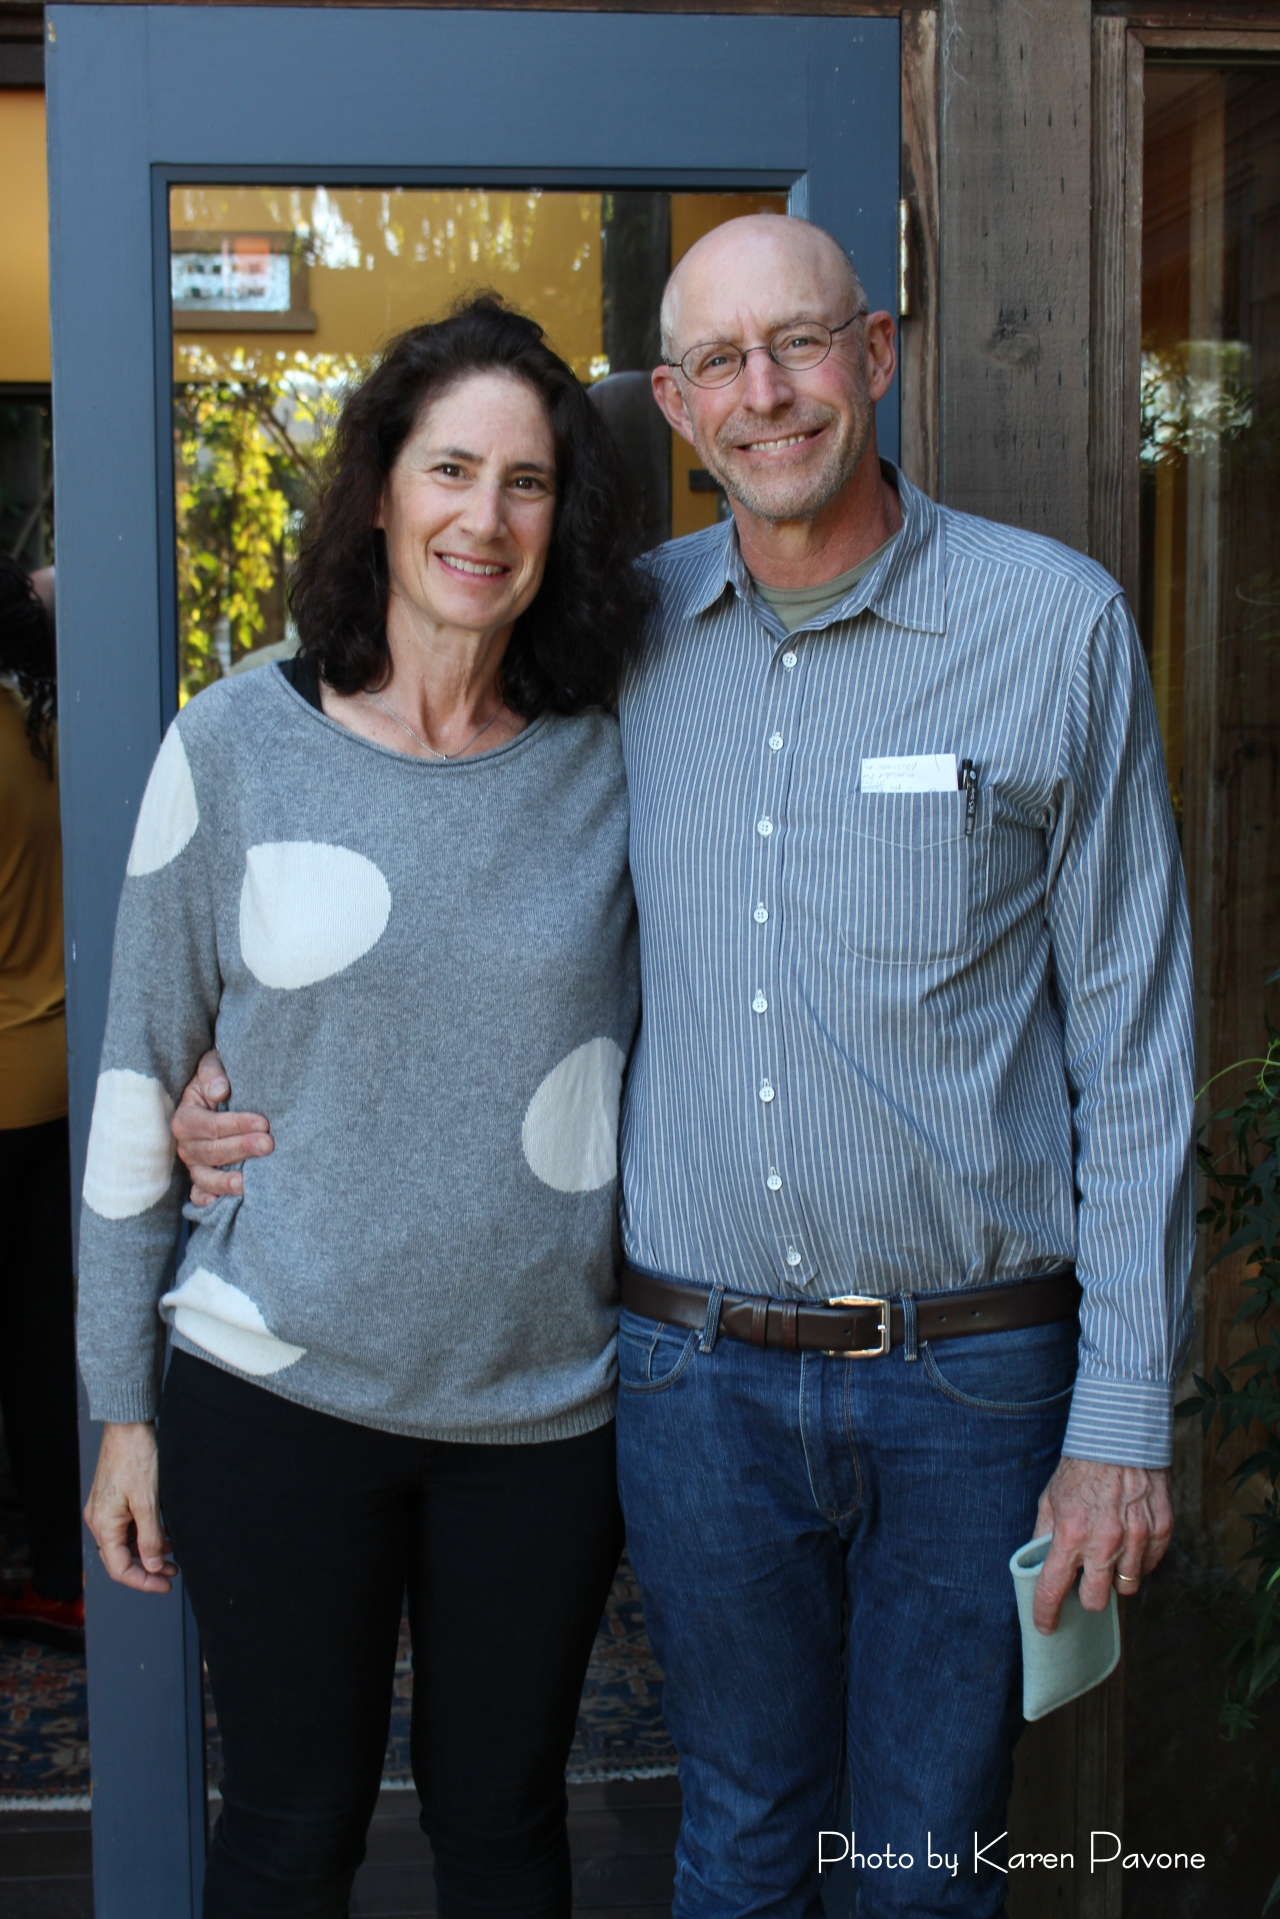 Michael Pollan & wife Judith Belzer